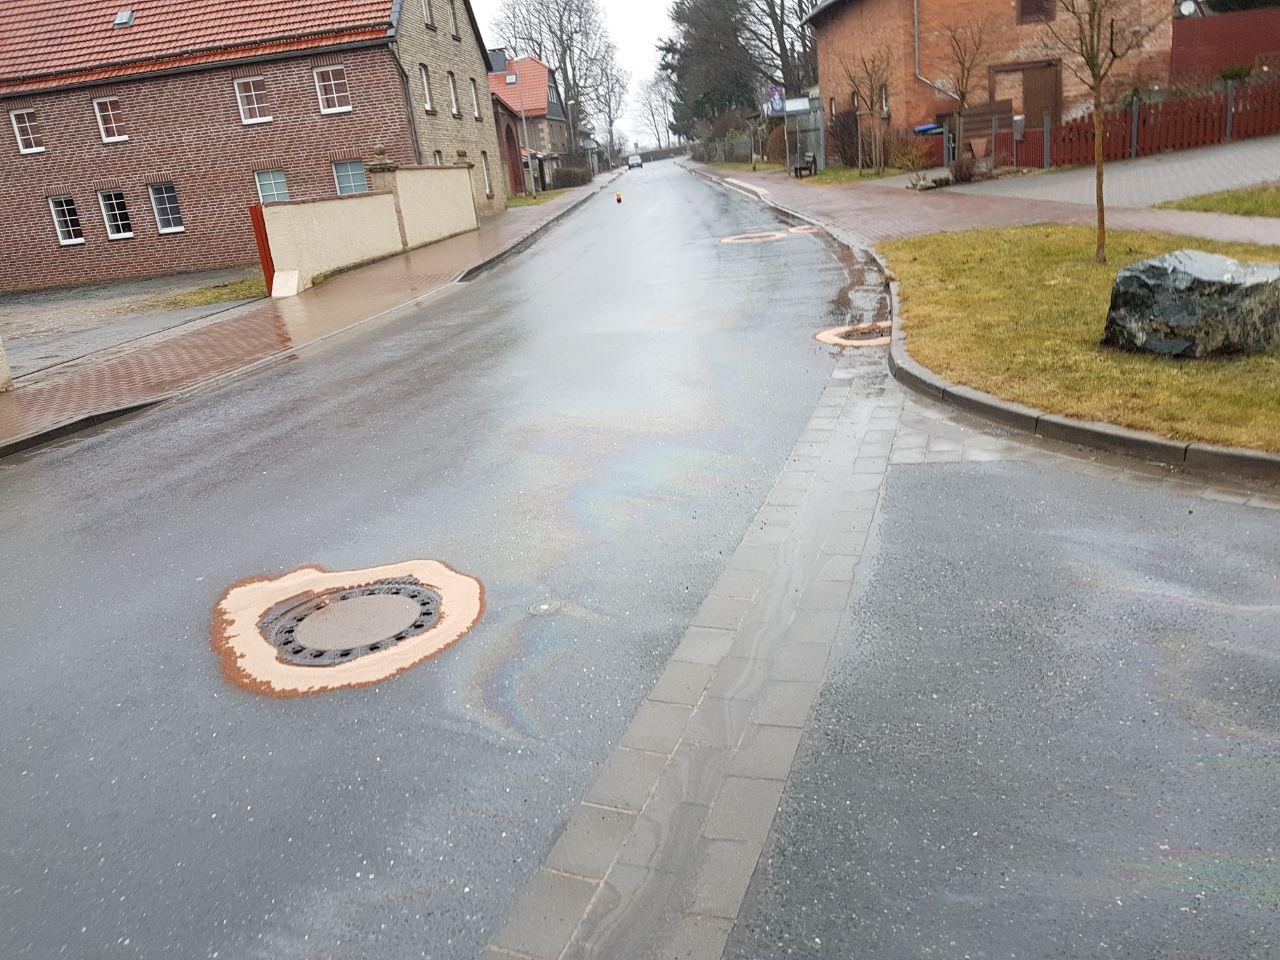 Einsatz Öl1 Salzgitterstraße in Haverlah